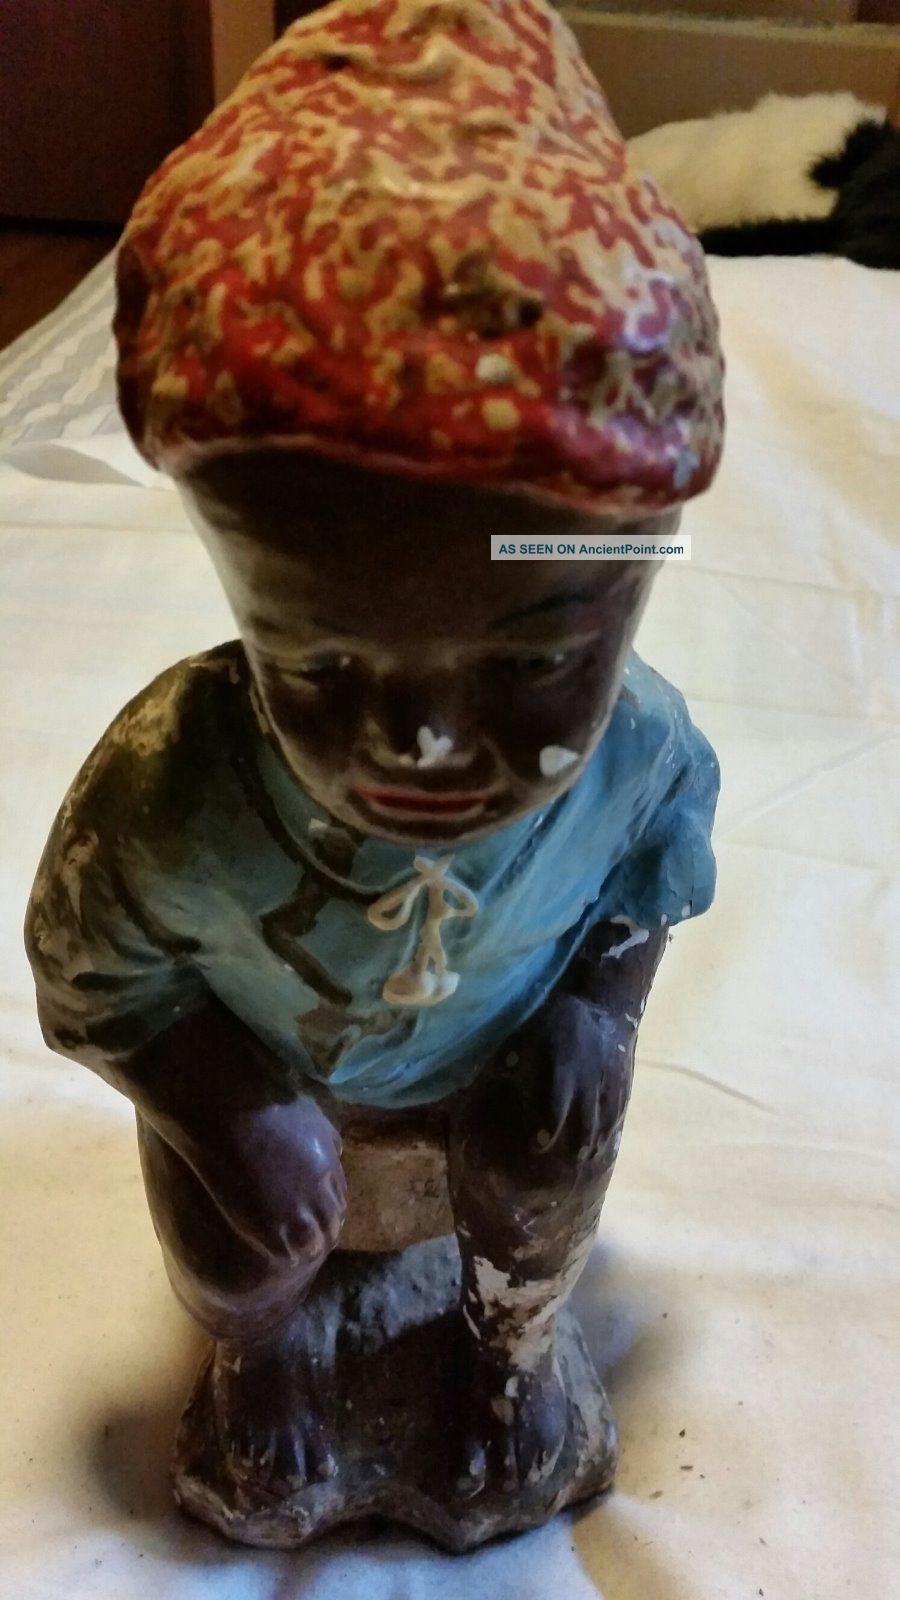 Vintage Statue Of A Black Boy Sitting On A Pot Sculptures & Statues photo